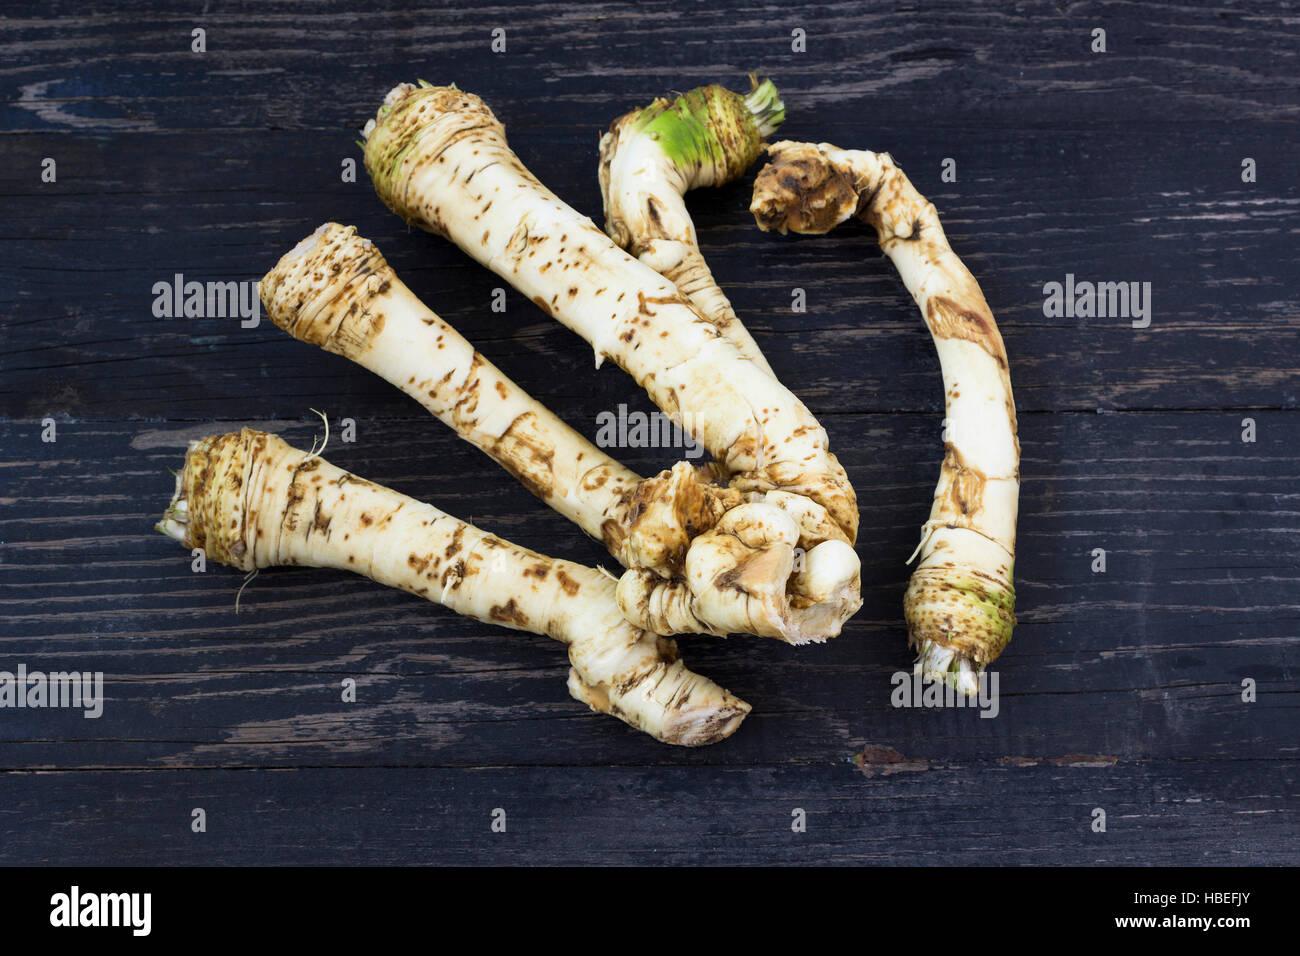 Fresh horseradish roots on wooden background - Stock Image